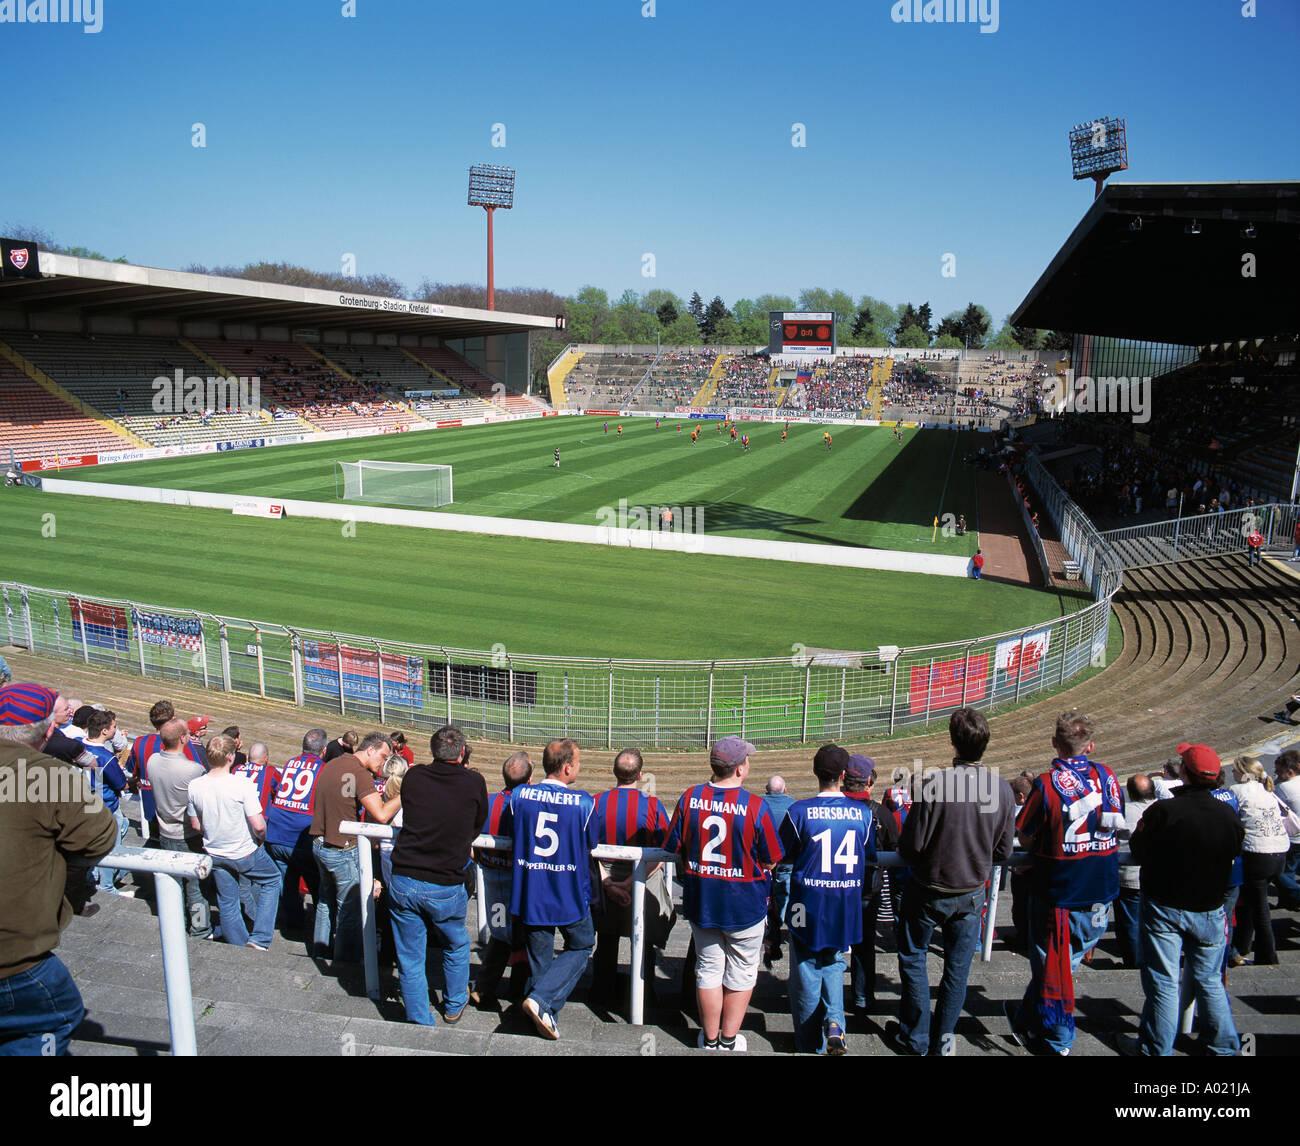 D-Krefeld, Lower Rhine, North Rhine-Westphalia, D-Krefeld-Uerdingen, sports, football, Regionalliga North, 2004/2005, KFC Uerdingen 05 versus SV Wuppertal 1:1, Grotenburg Stadium, total view, panorama, crowd of spectators, Wuppertal fans, not many spectat - Stock Image